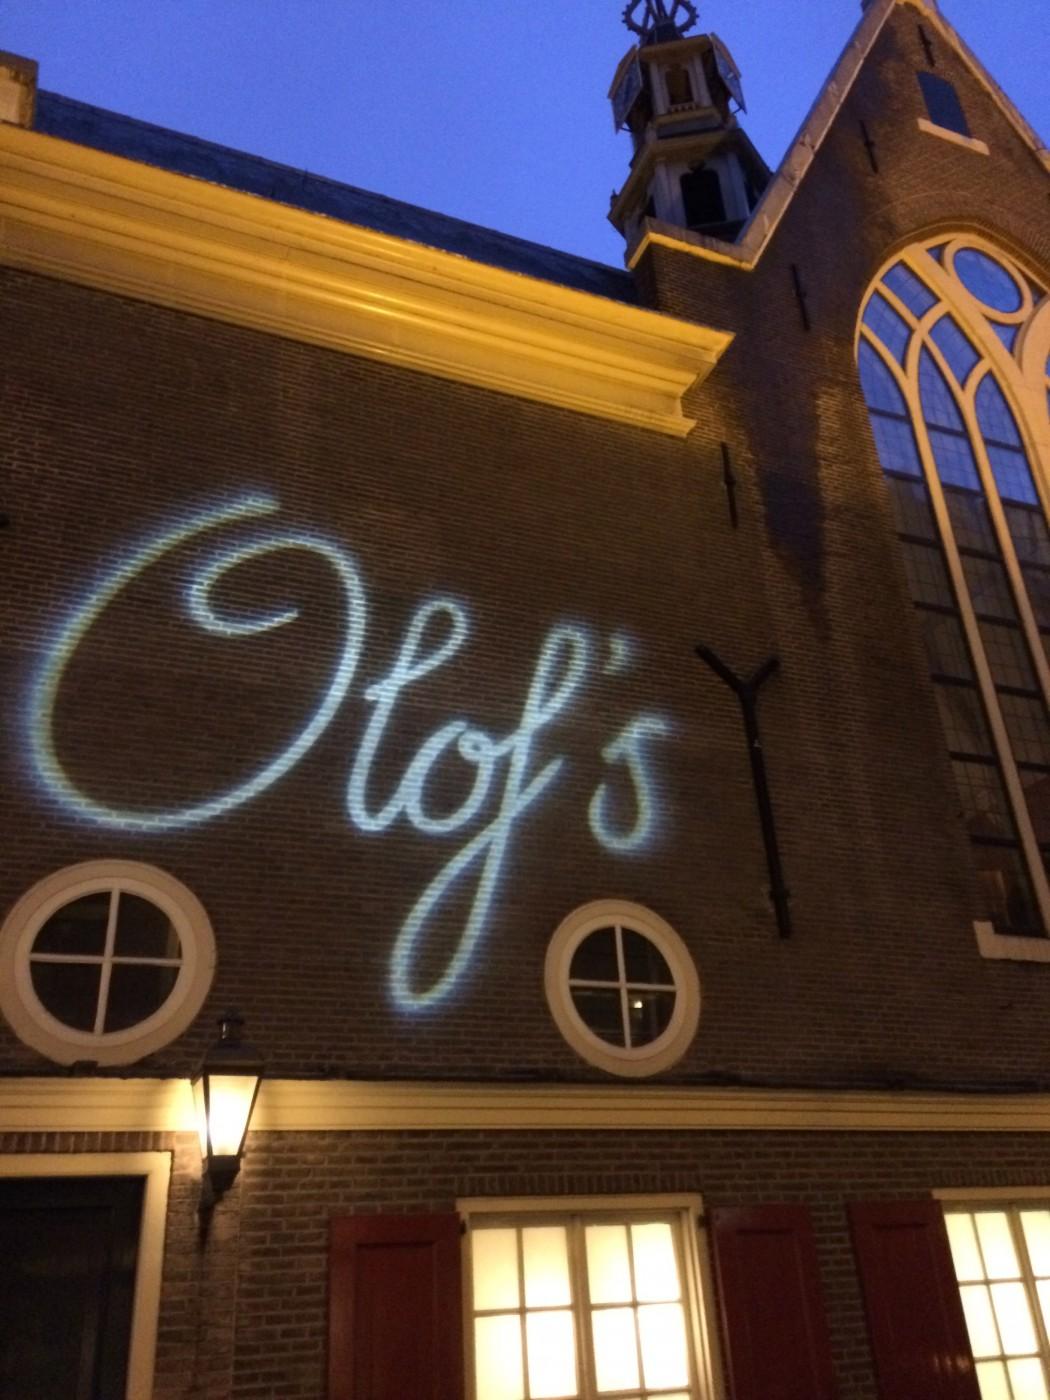 Olofs1